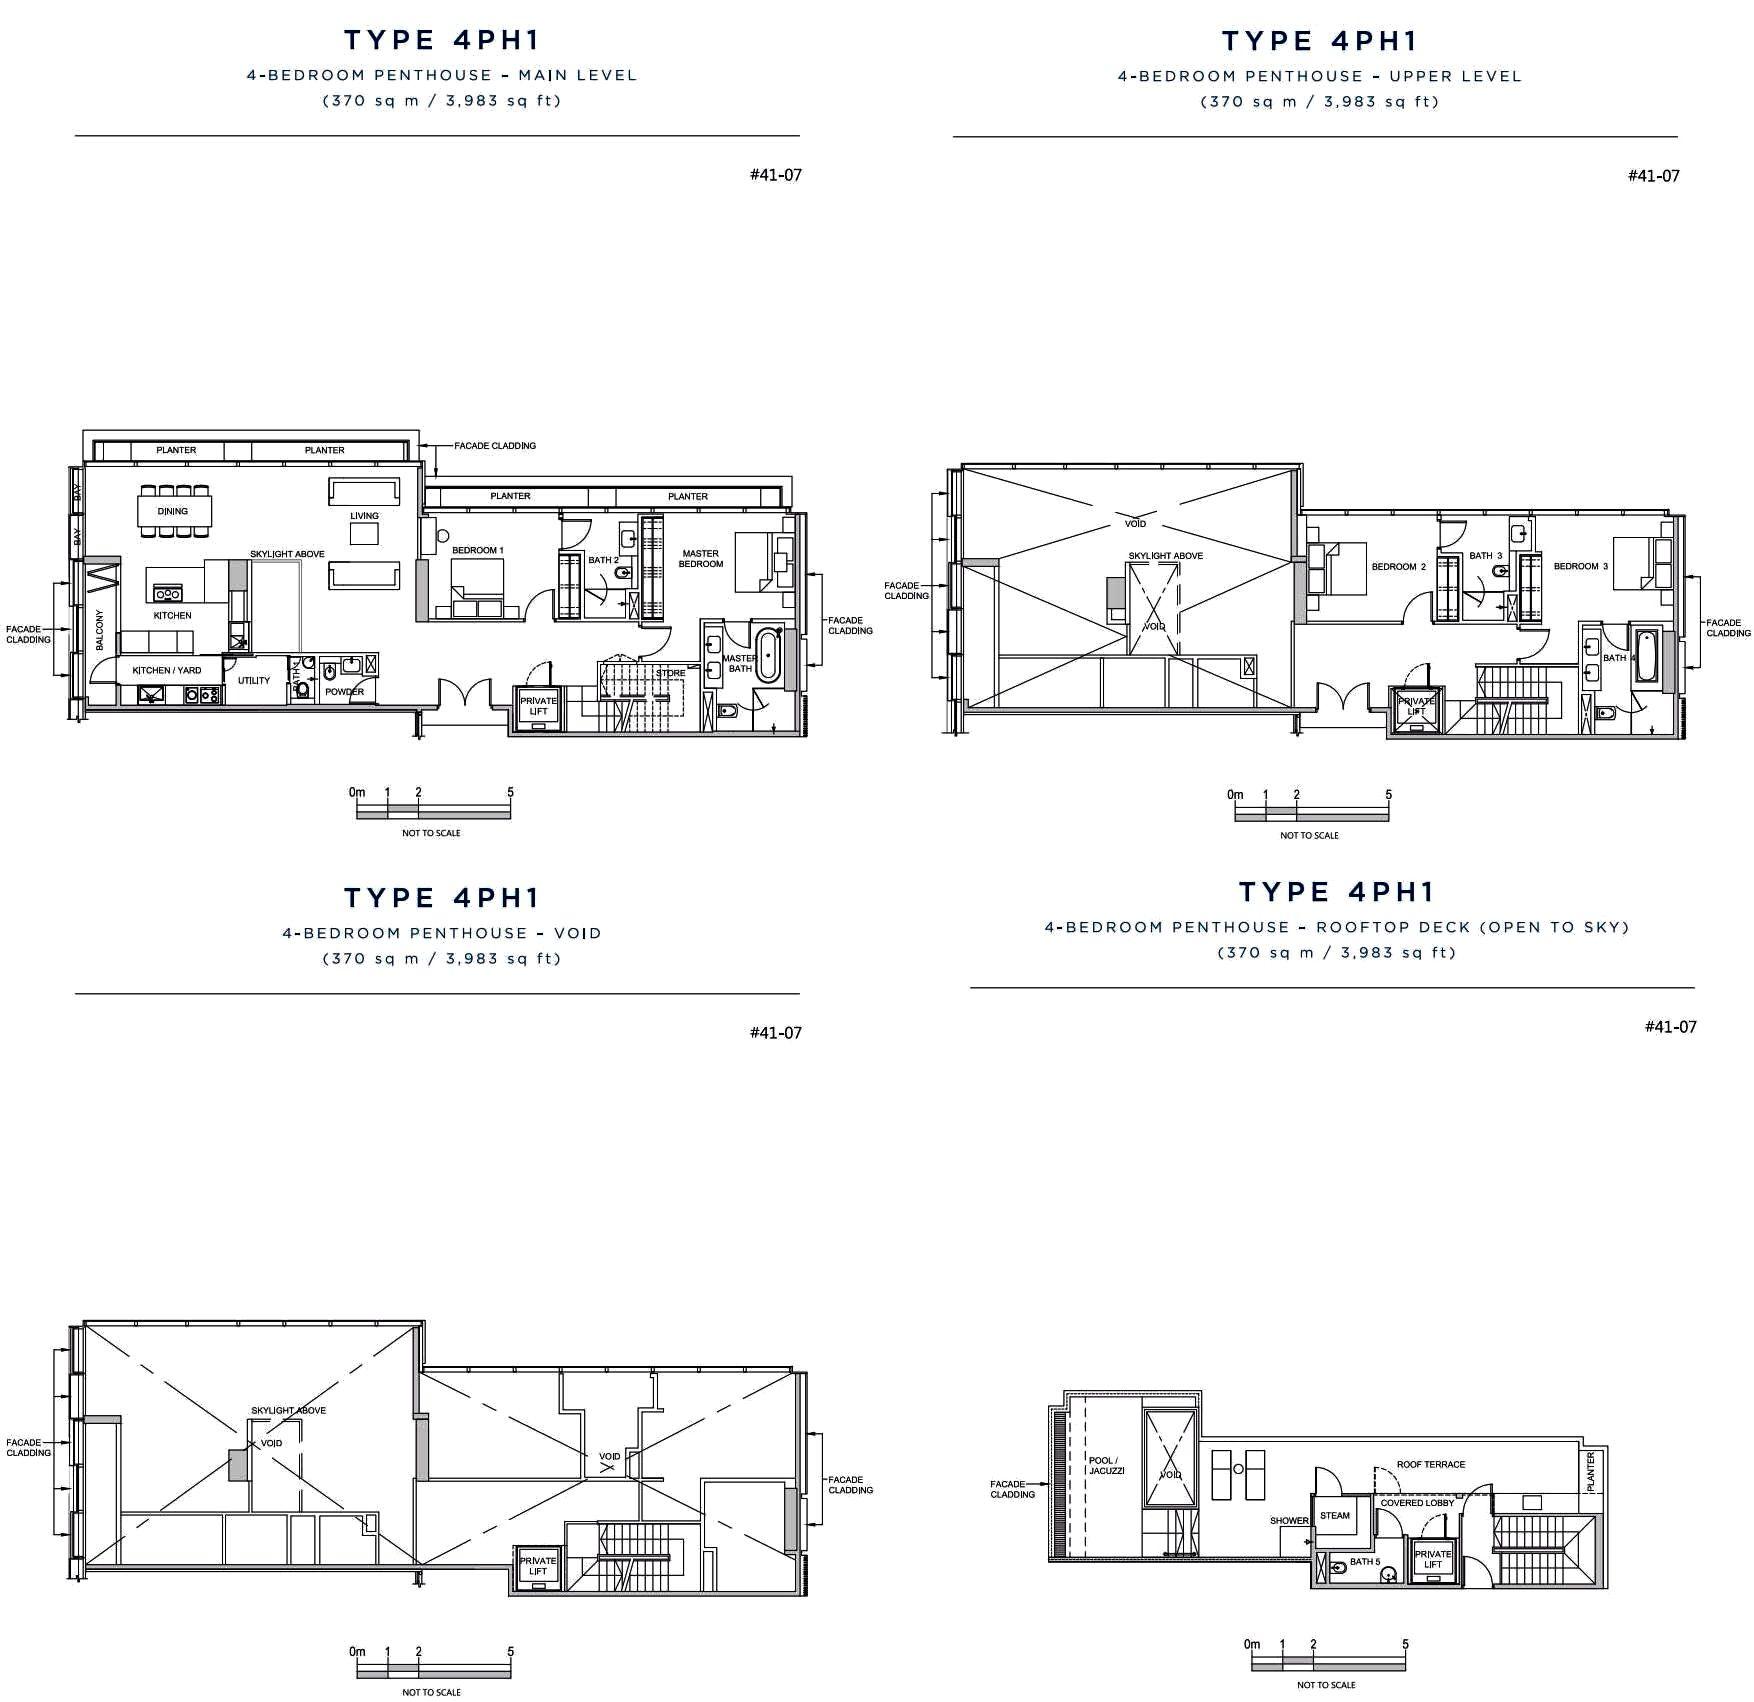 South Beach Residences Singapore Penthouse 4 Bedroom Pent House Penthouse Floor Plans